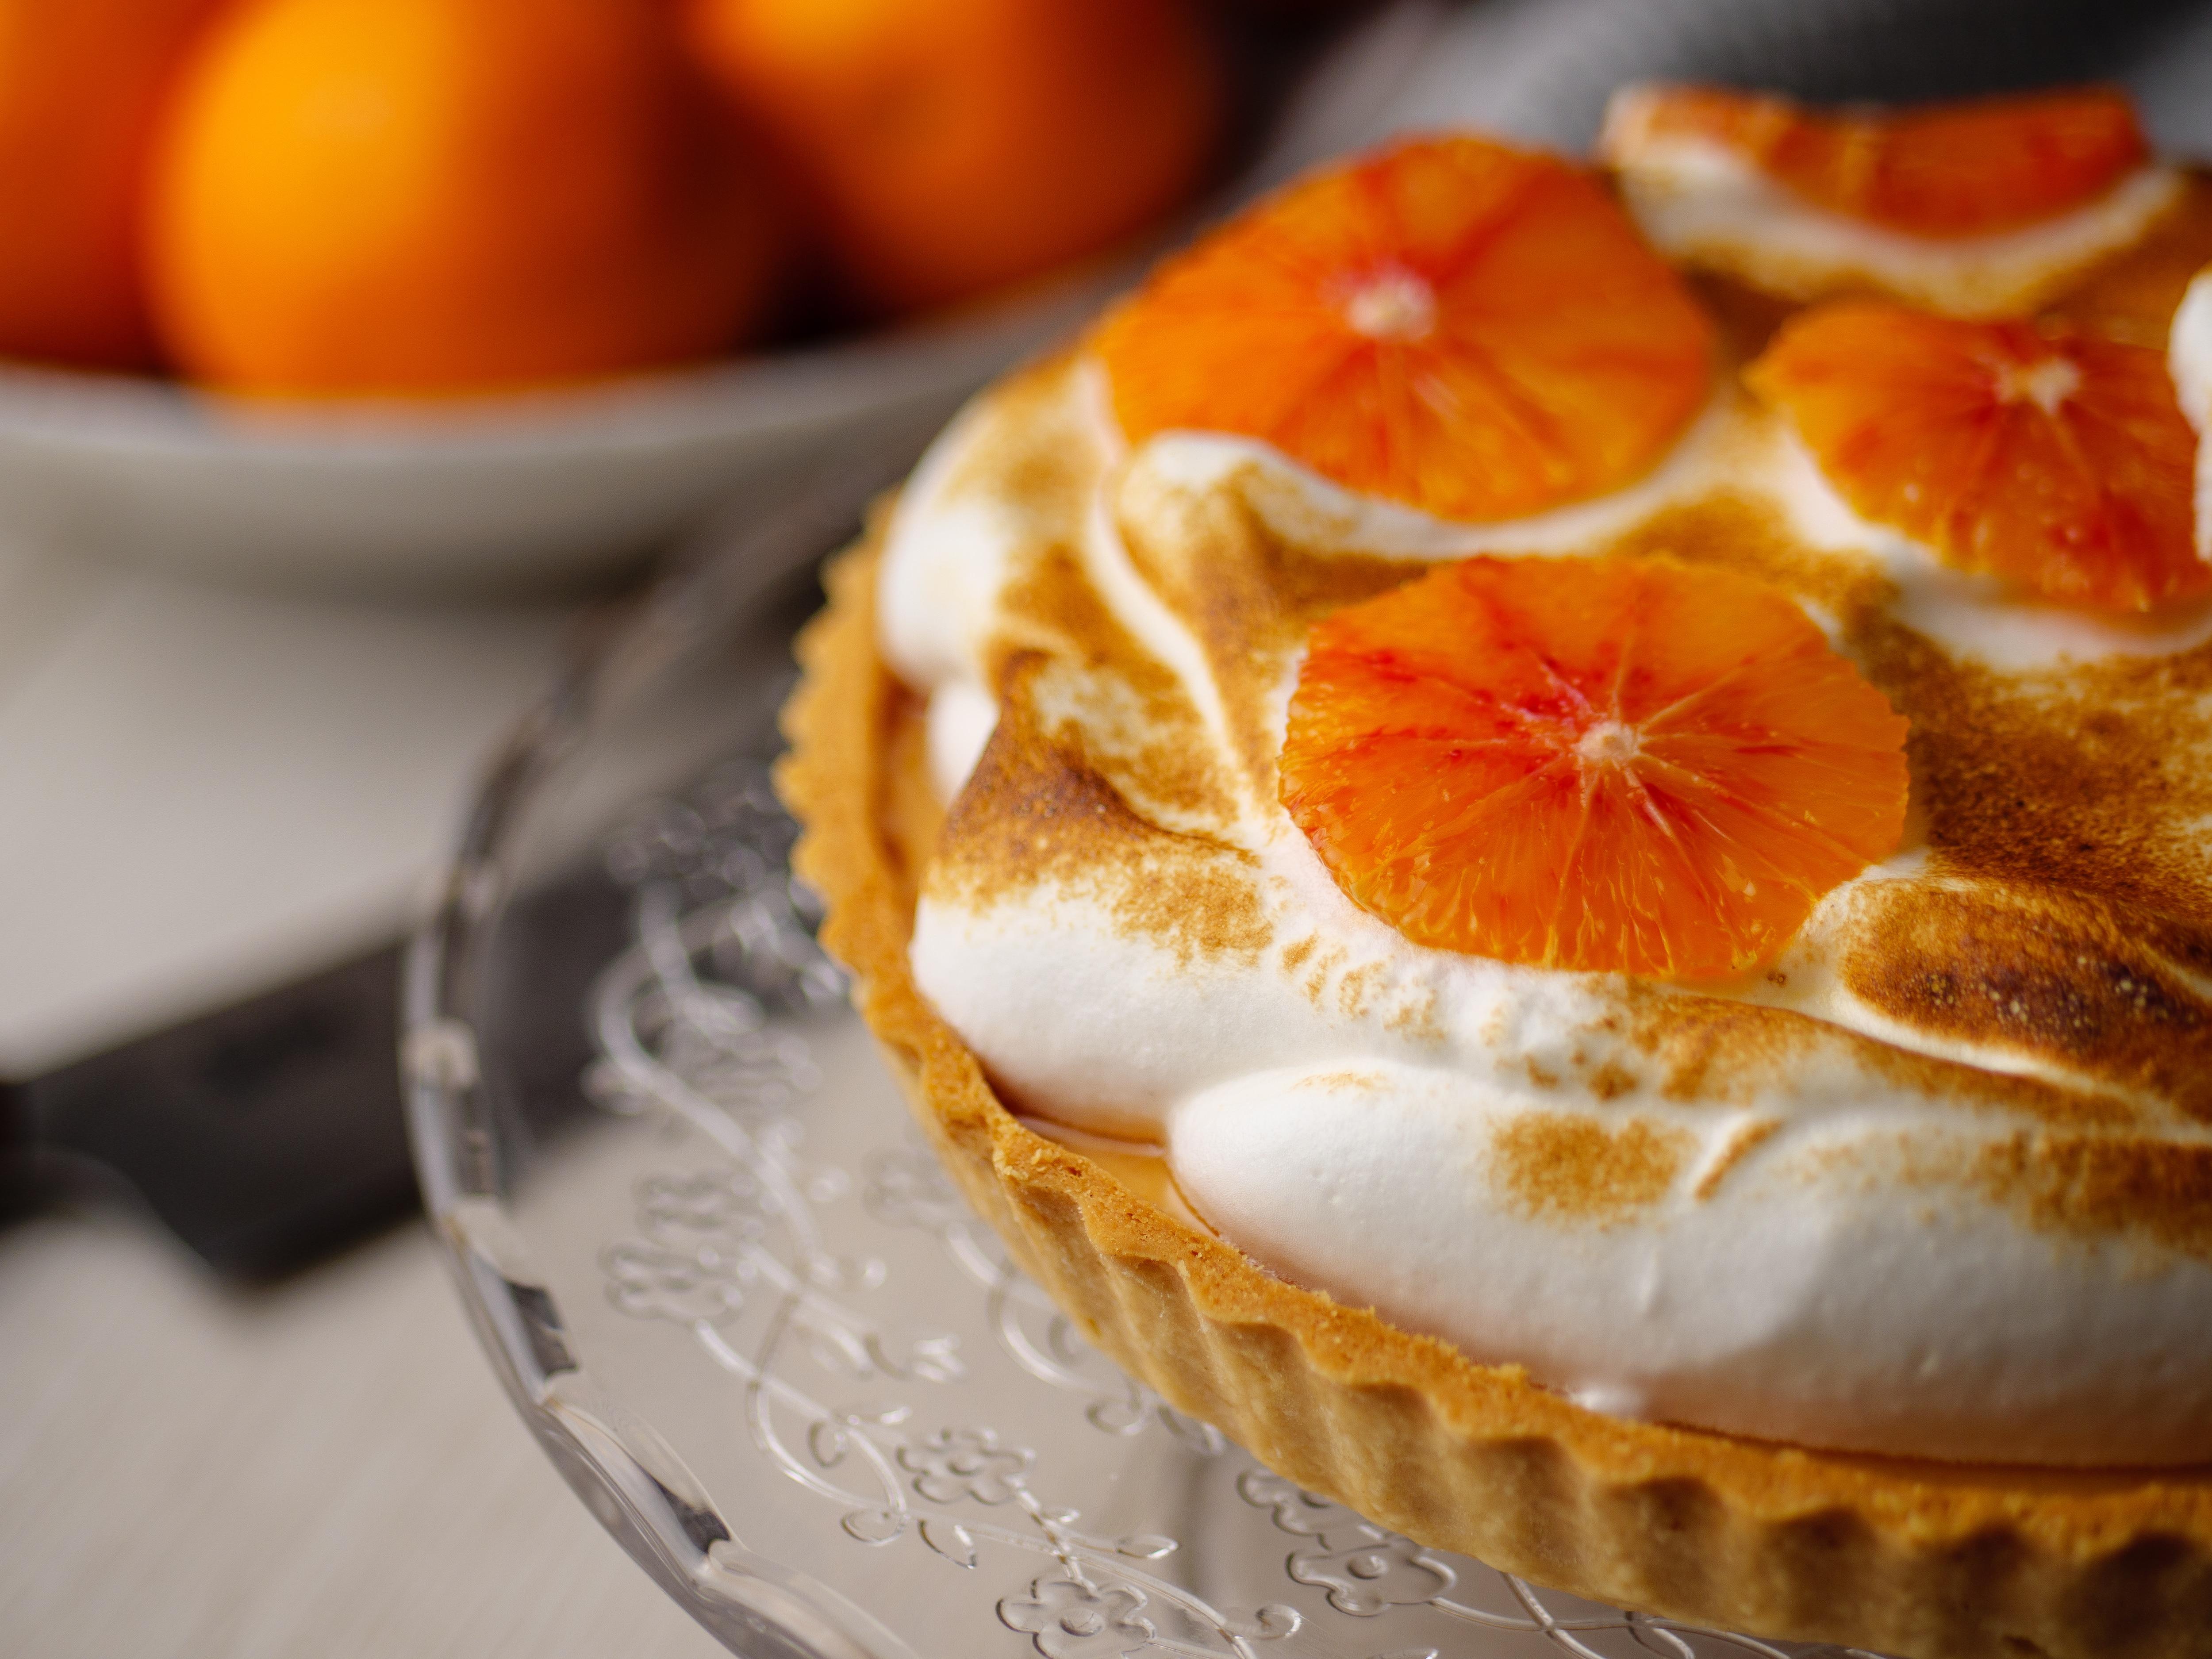 Blood Orange Meringue Tart